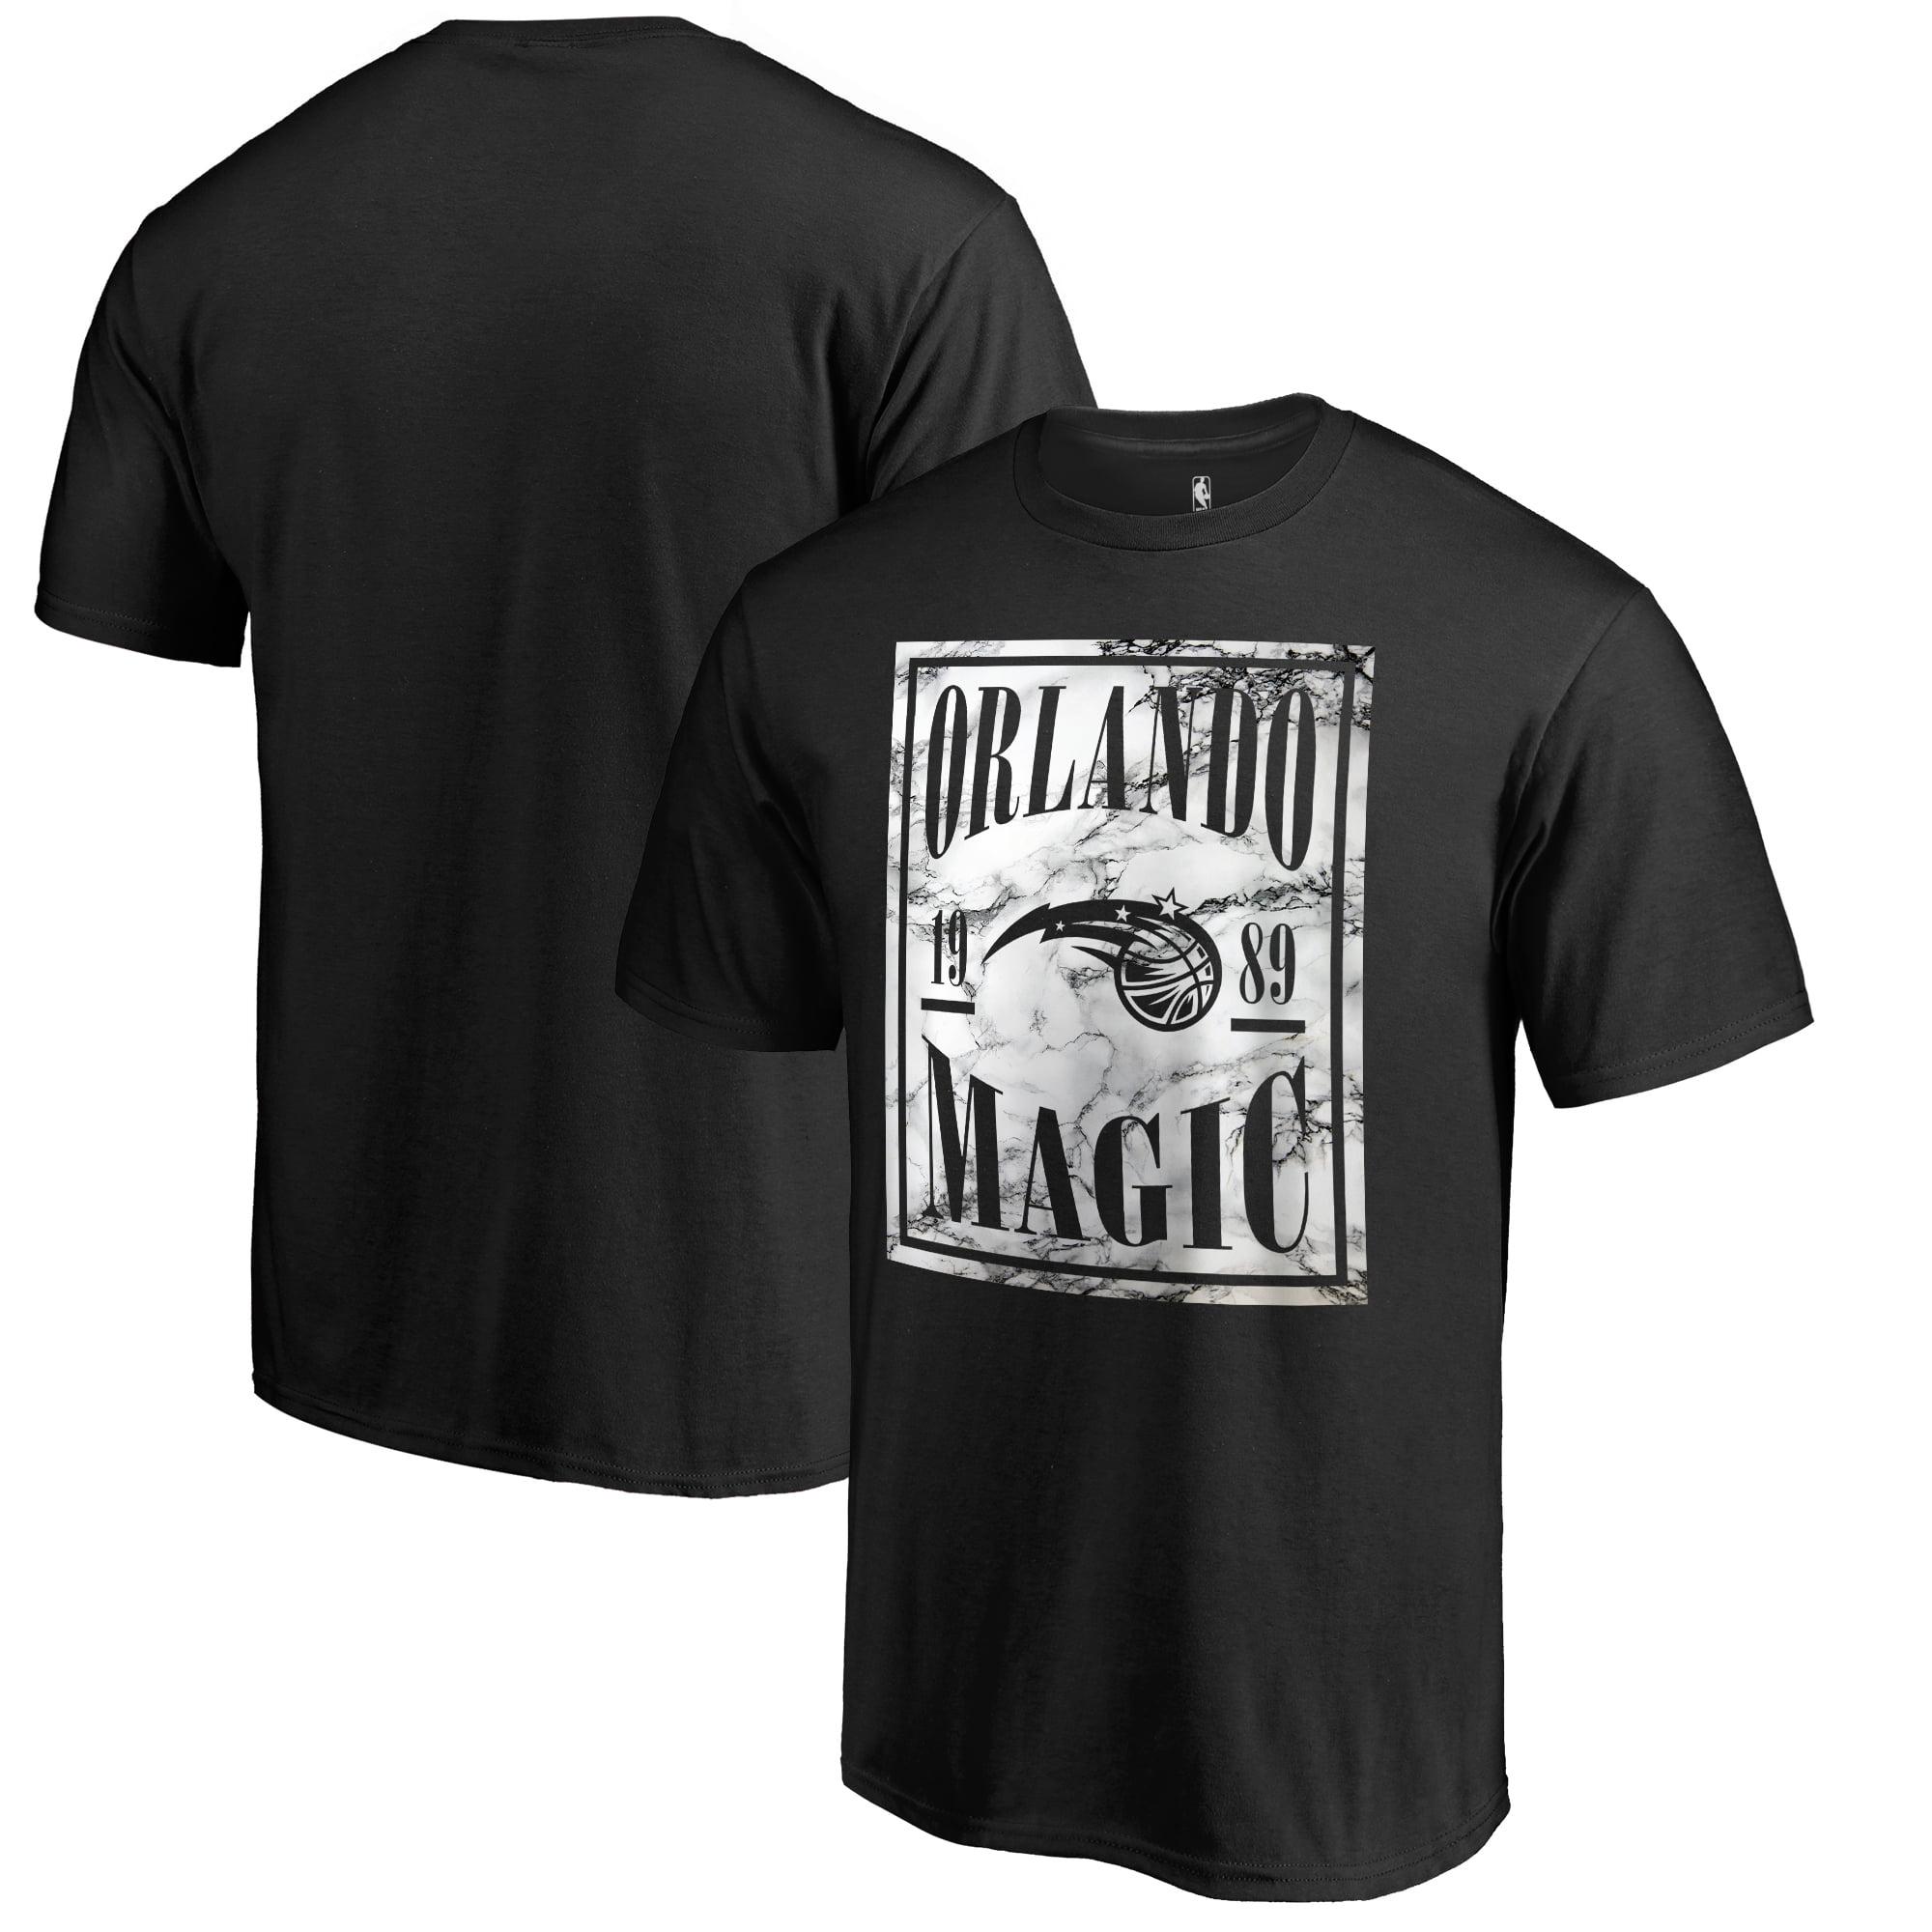 Fanatics Branded Orlando Magic Black Court Vision T-Shirt